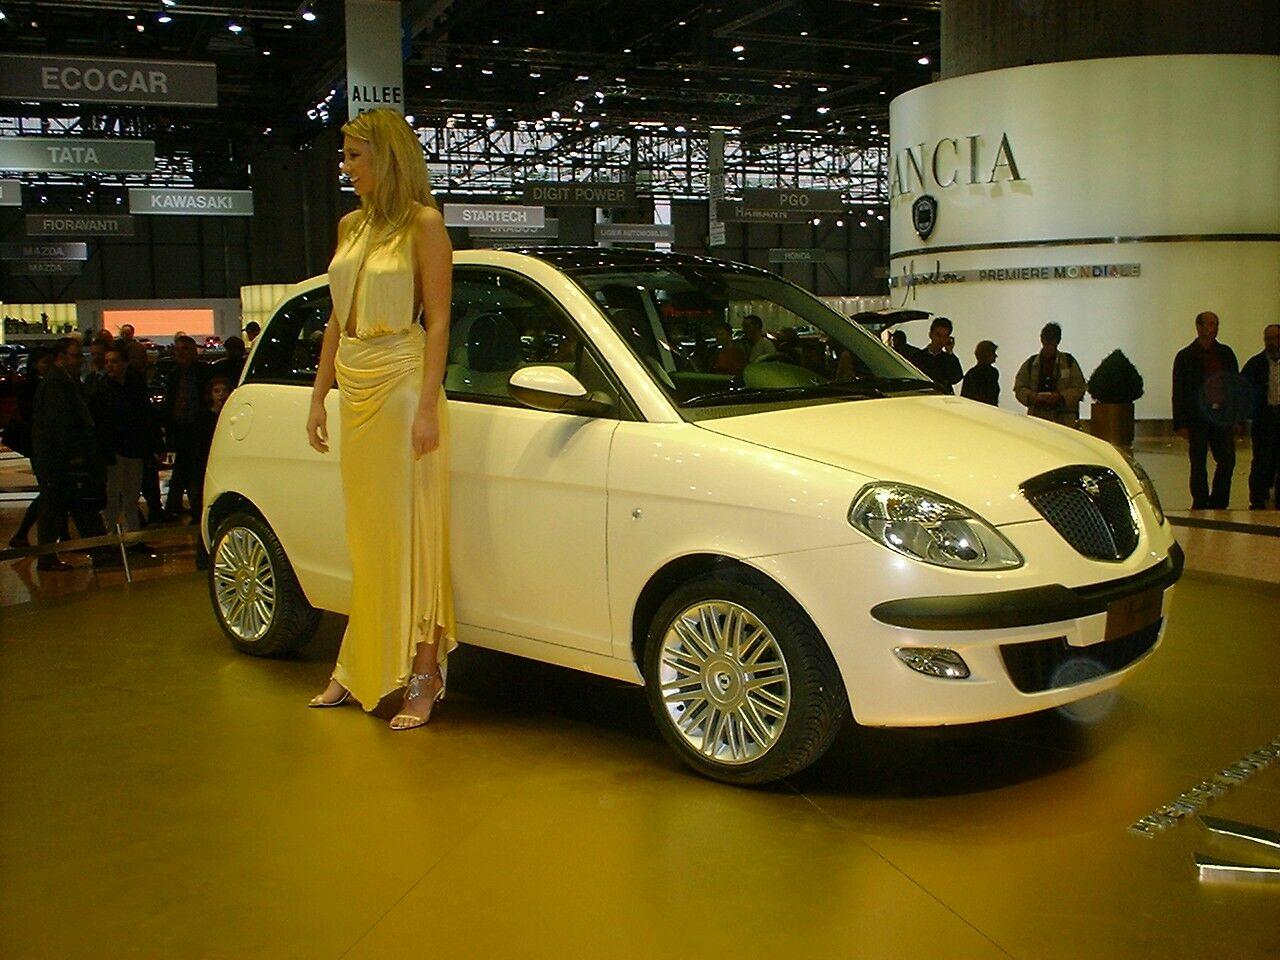 http://www.italiaspeed.com/news_2003/geneva_report/news_2003_043_105.jpg